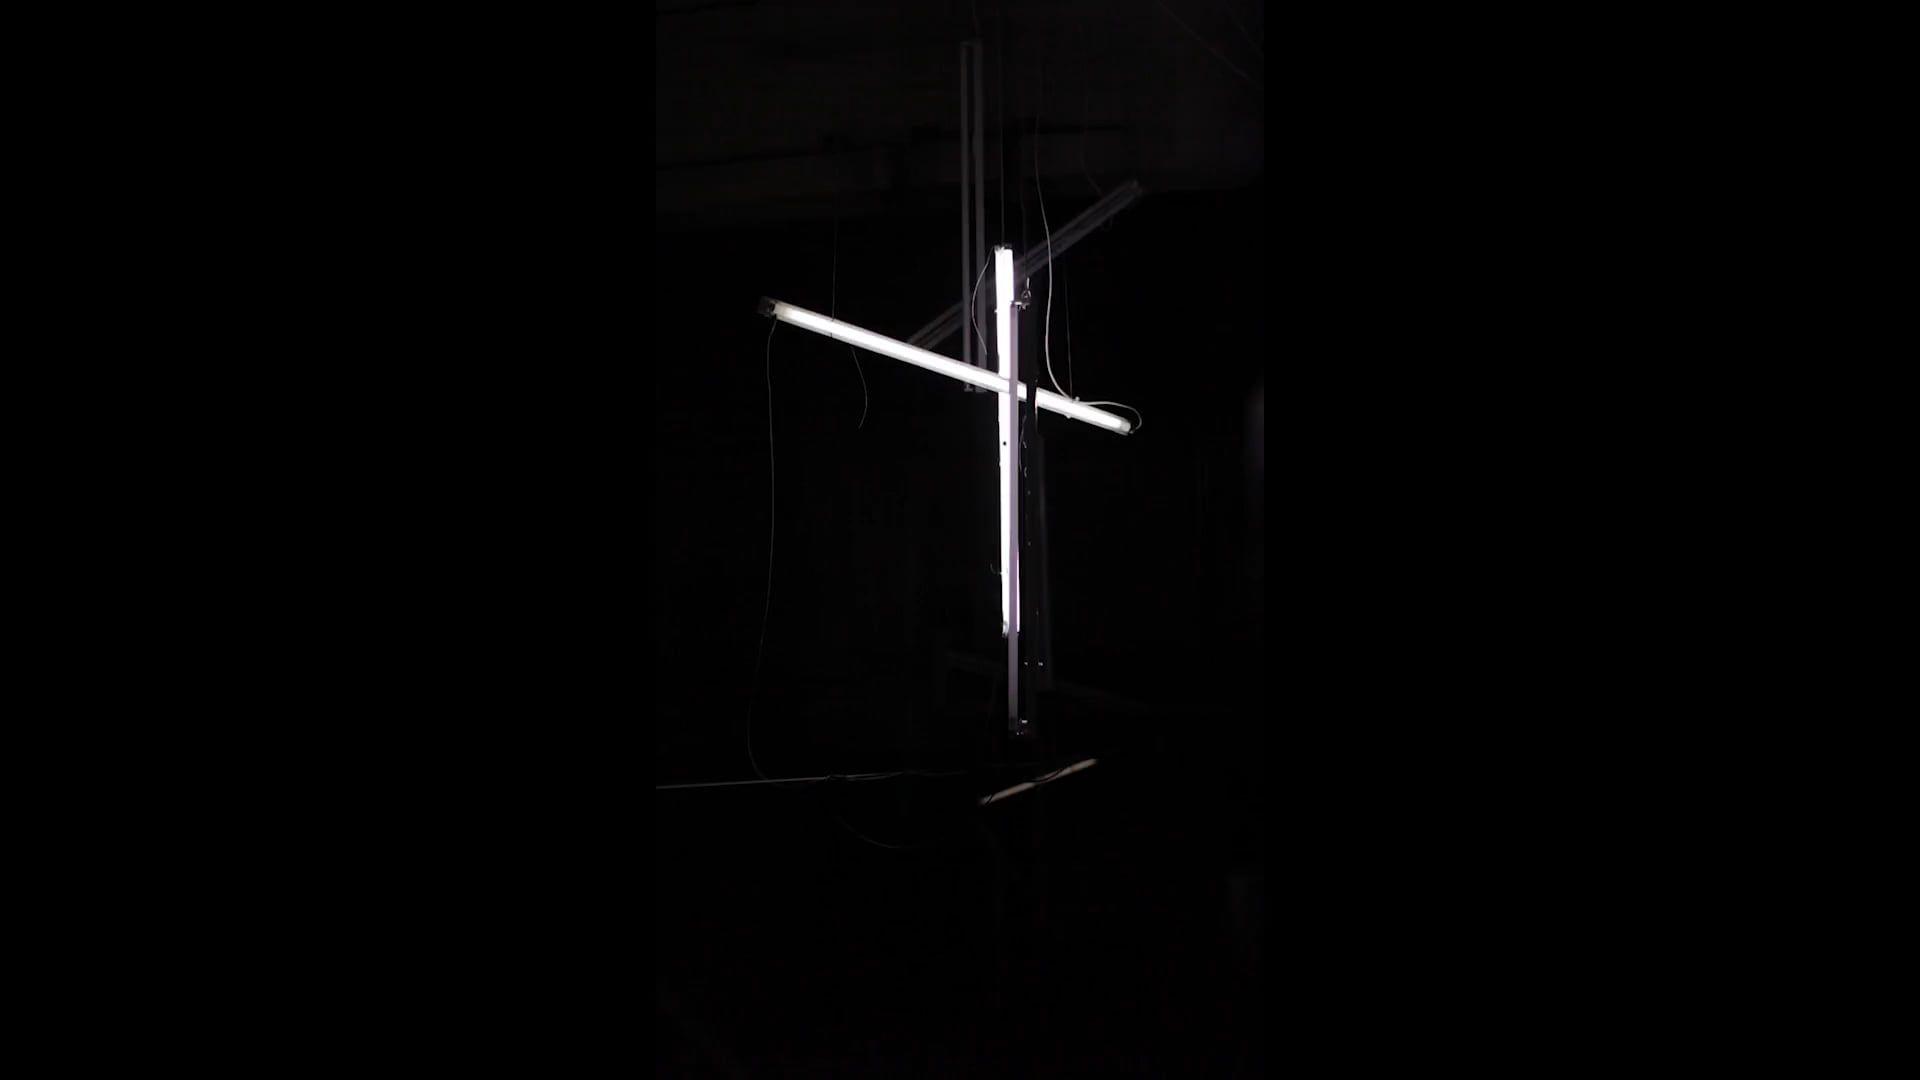 LAYTBEUIS Collective, Susurrus Lights, Aggregate I – IV (2014 – )